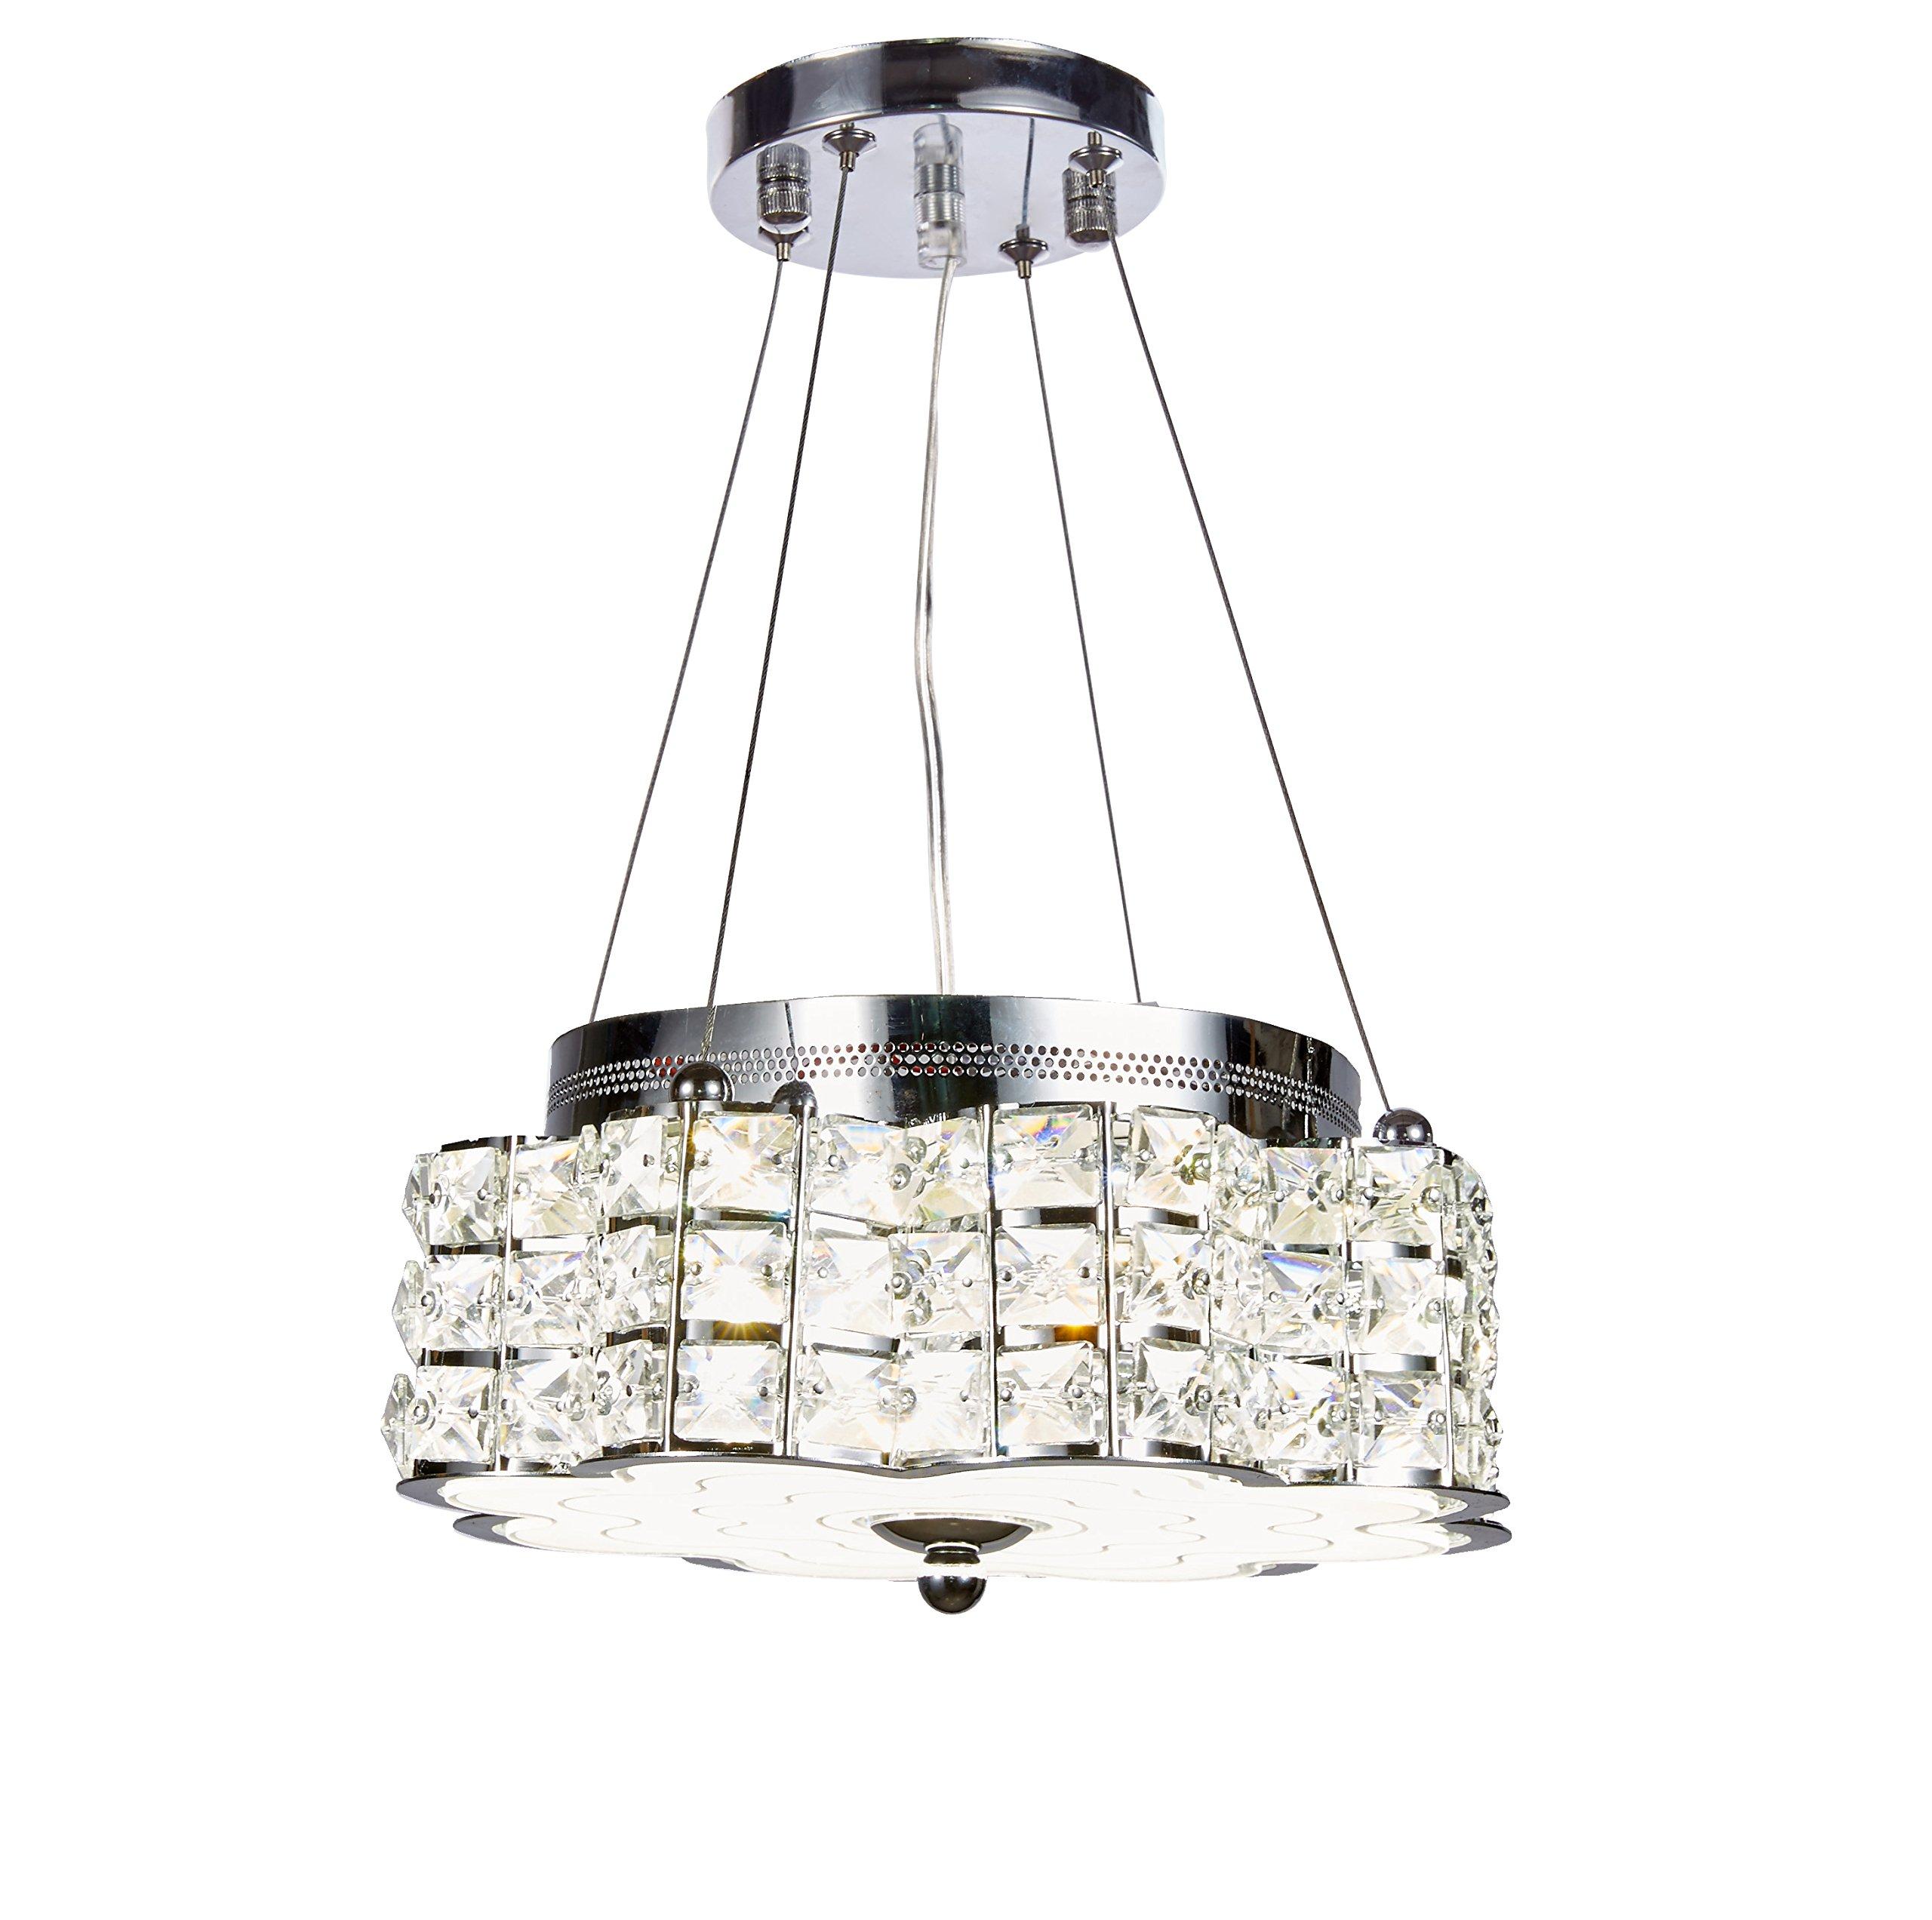 Top Lighting Modern LED Crystal Chandelier Pendant Hanging or Flush Mount Ceiling Lighting Fixture, 3 light colors in one Smart Lamp